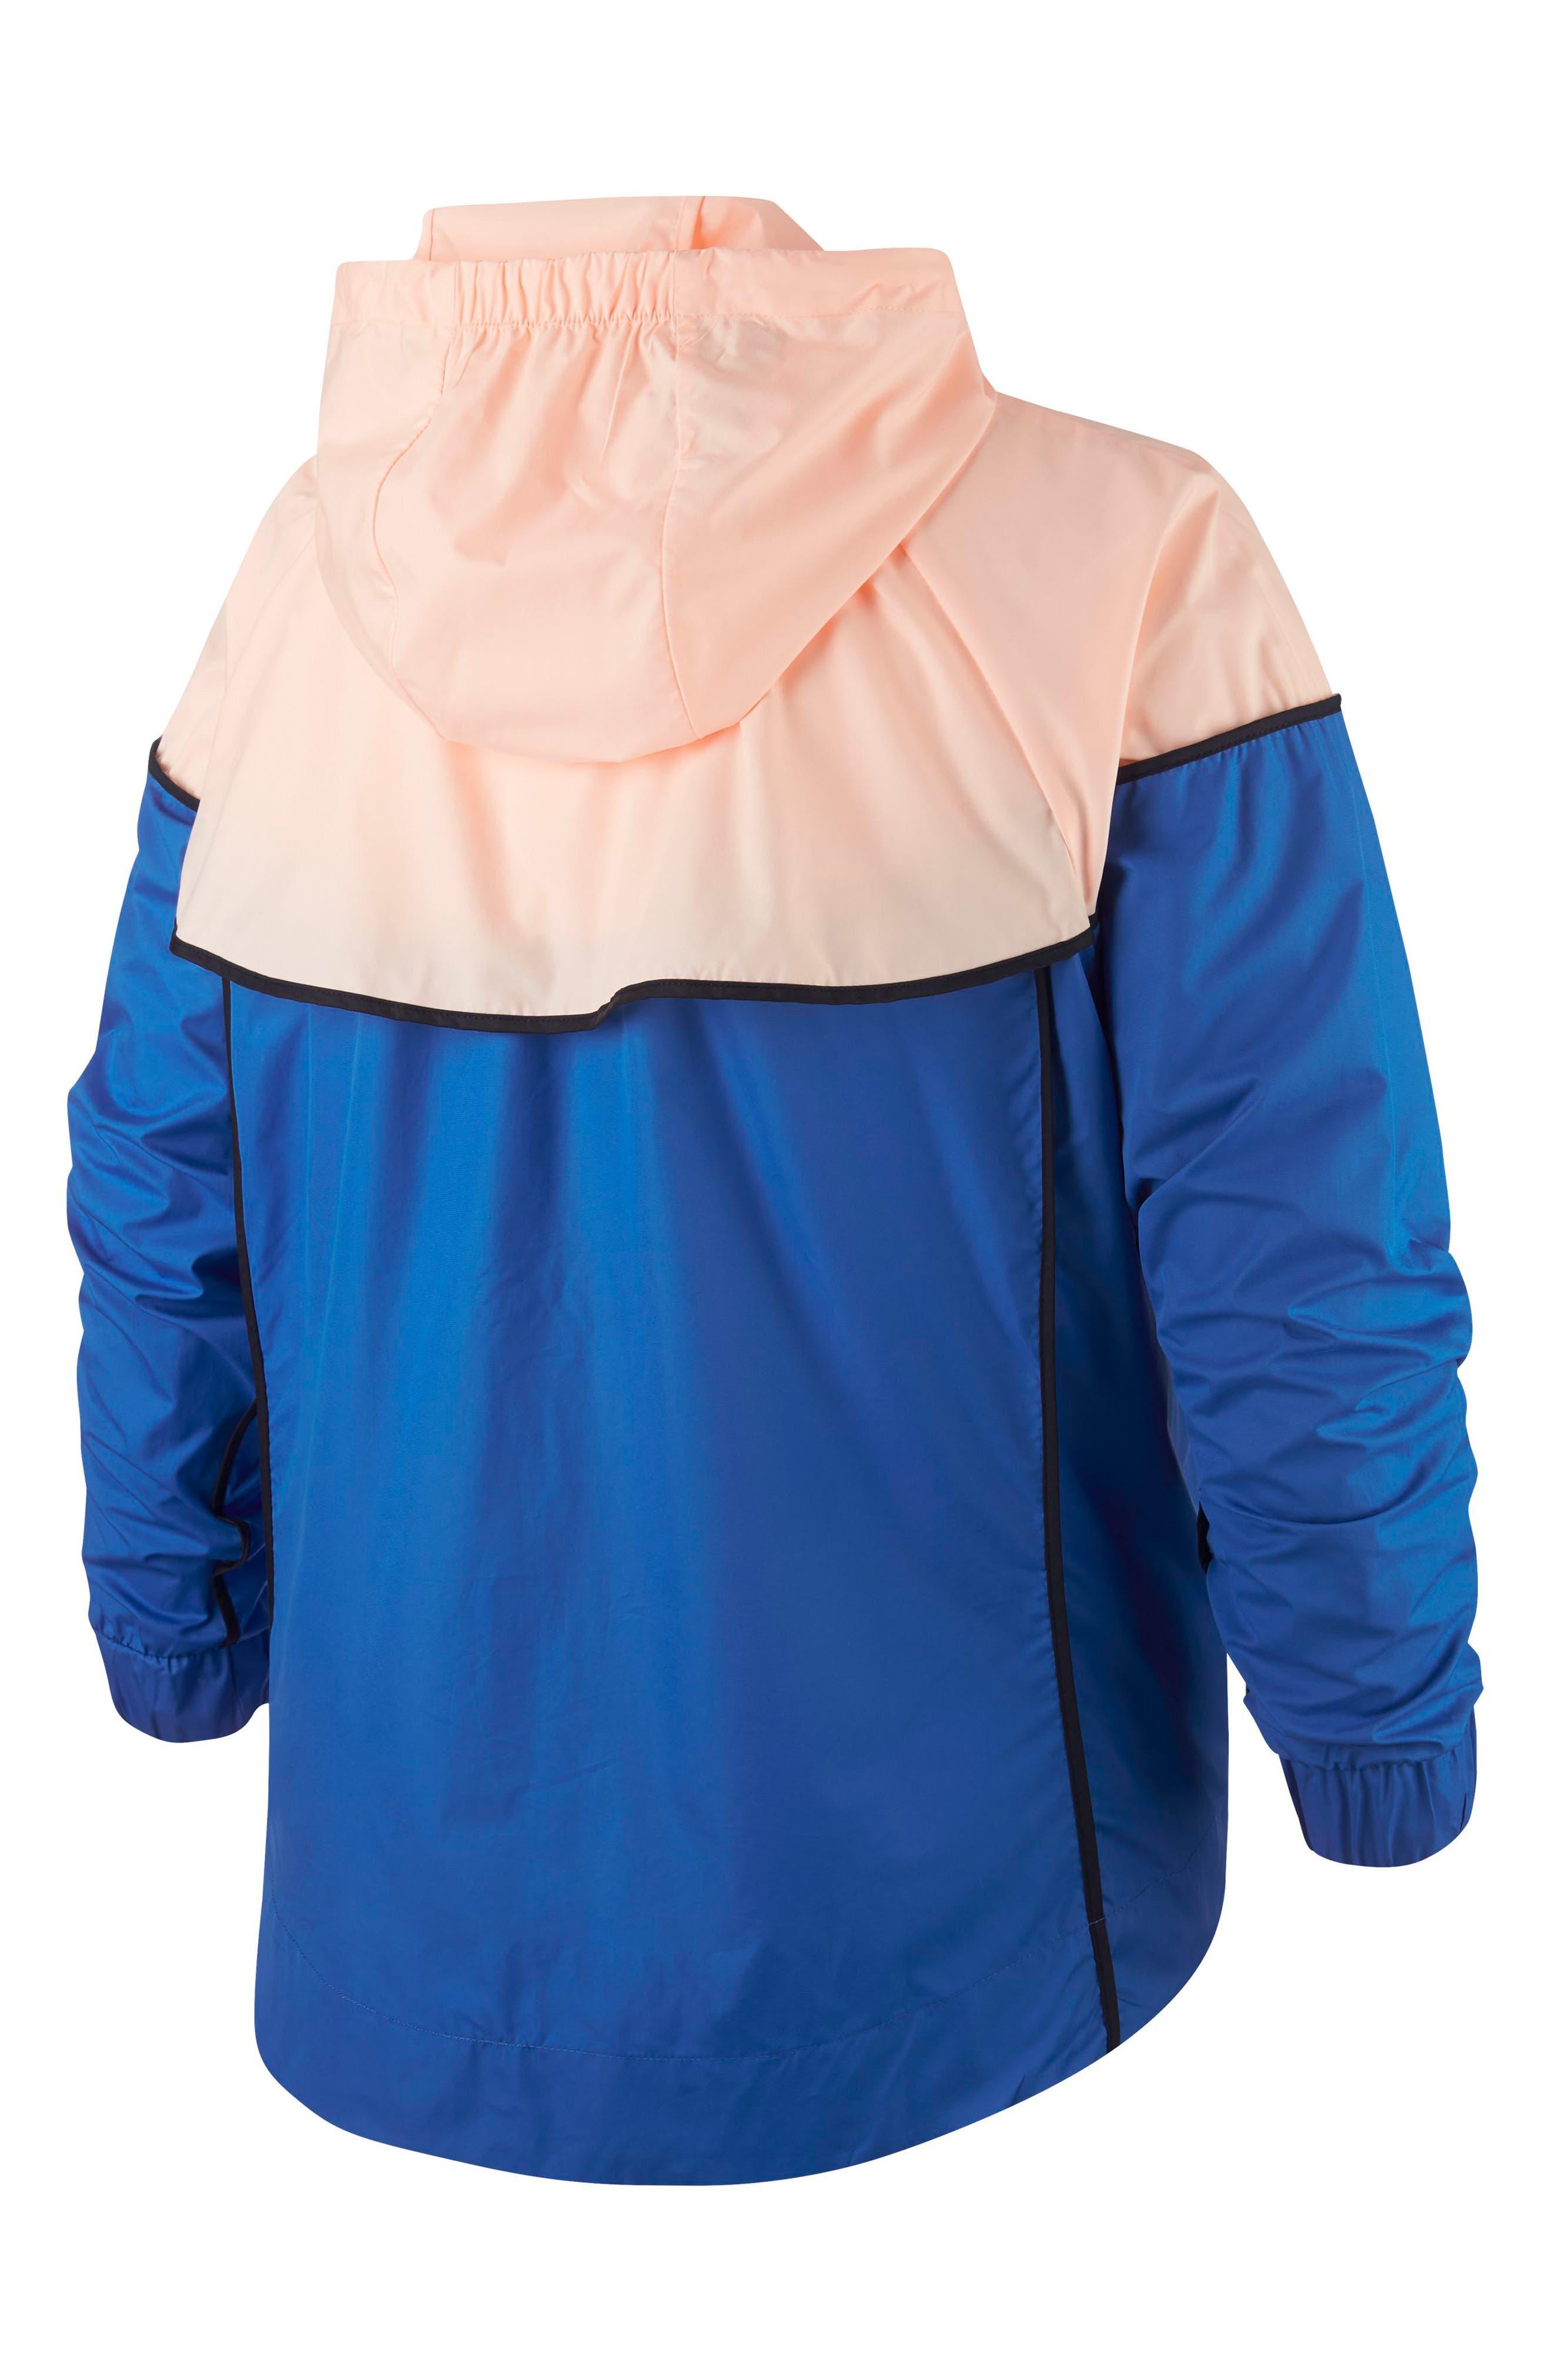 Sportswear Windrunner Jacket,                             Alternate thumbnail 2, color,                             SIGNAL BLUE/ CRIMSON TINT